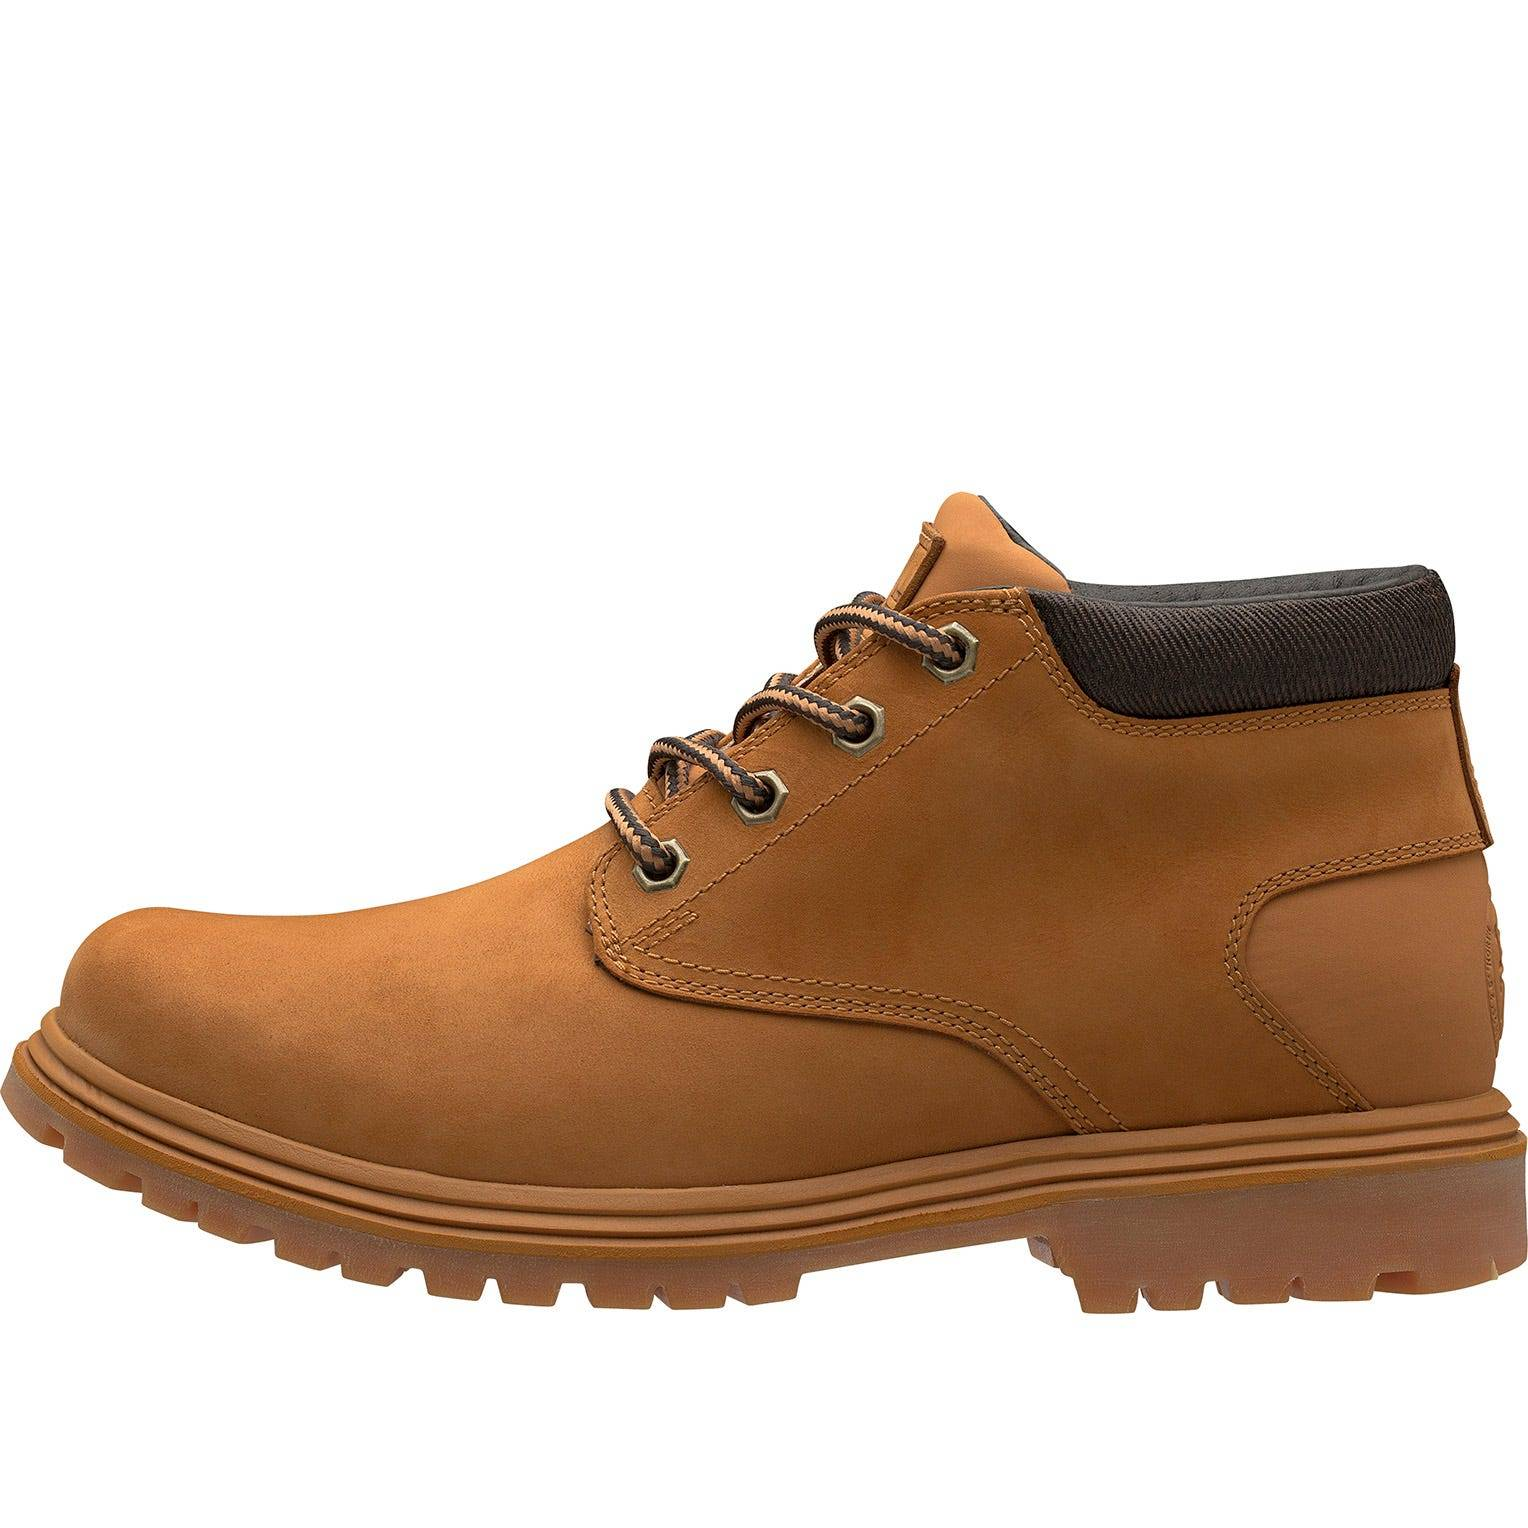 Helly Hansen Saddleback Chukka Mens Casual Shoe Brown 41/8